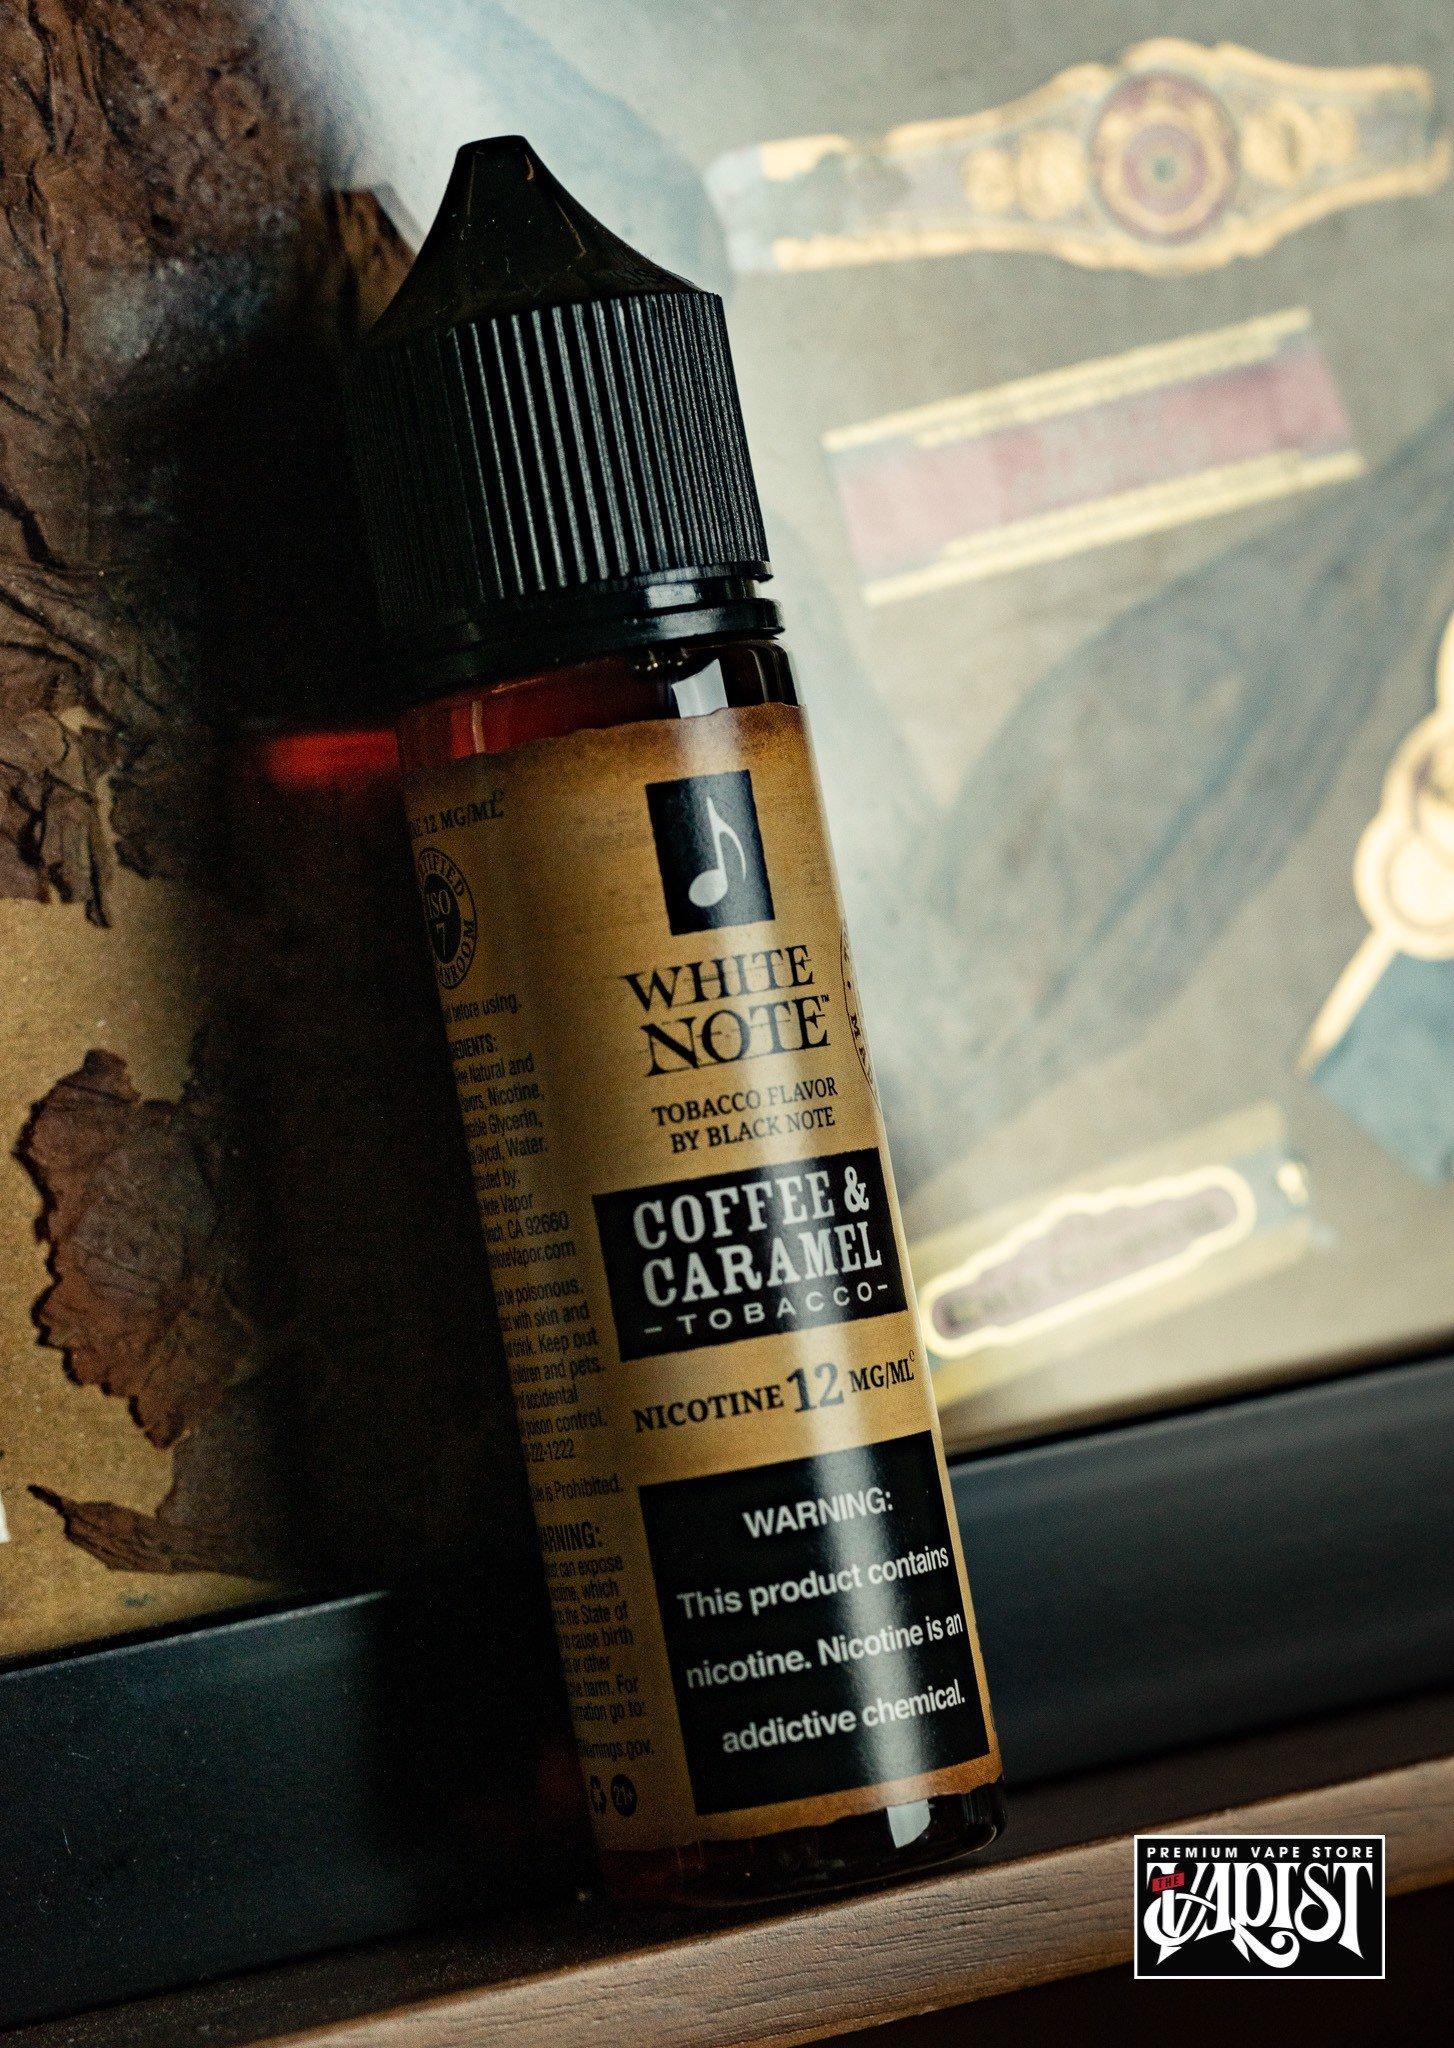 White Note - Coffee & Caramel Tobacco